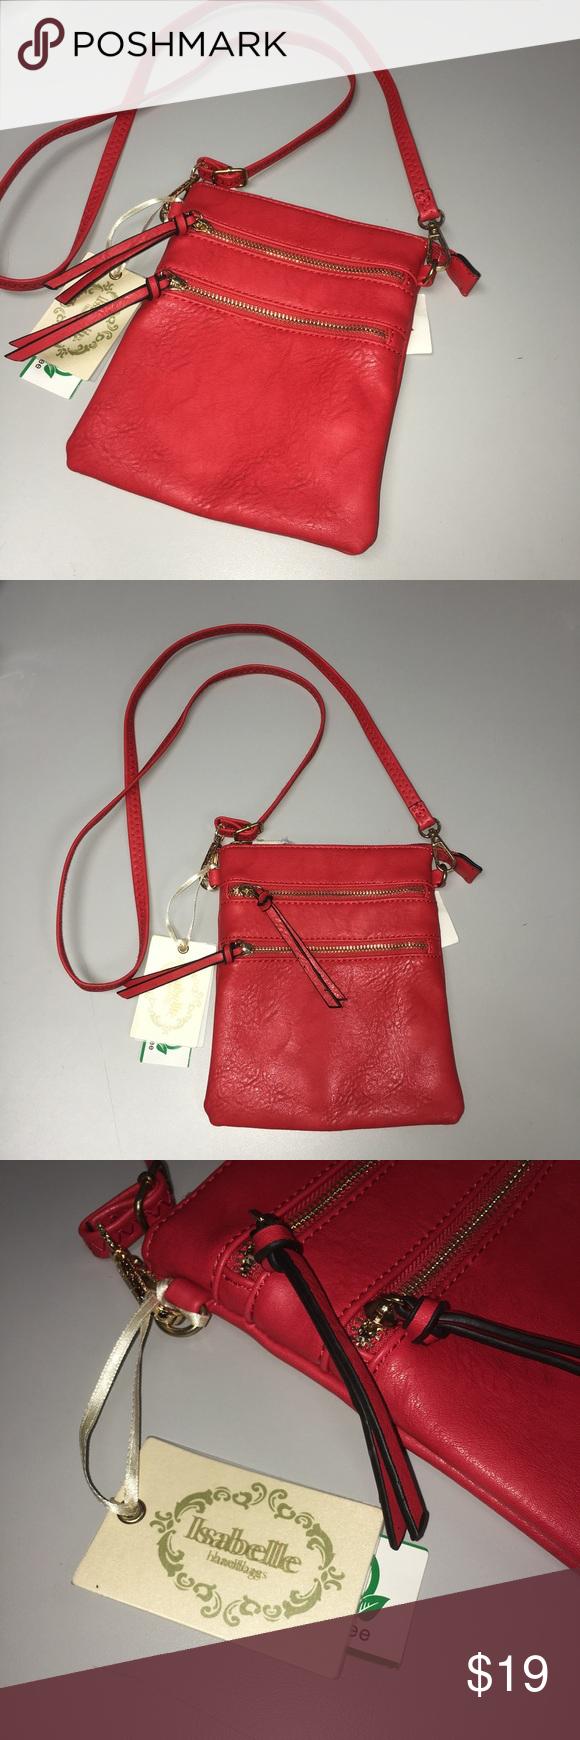 Isabelle Handbags Vegan Bpa Free Red Crossbody Nwt Nwts Bags